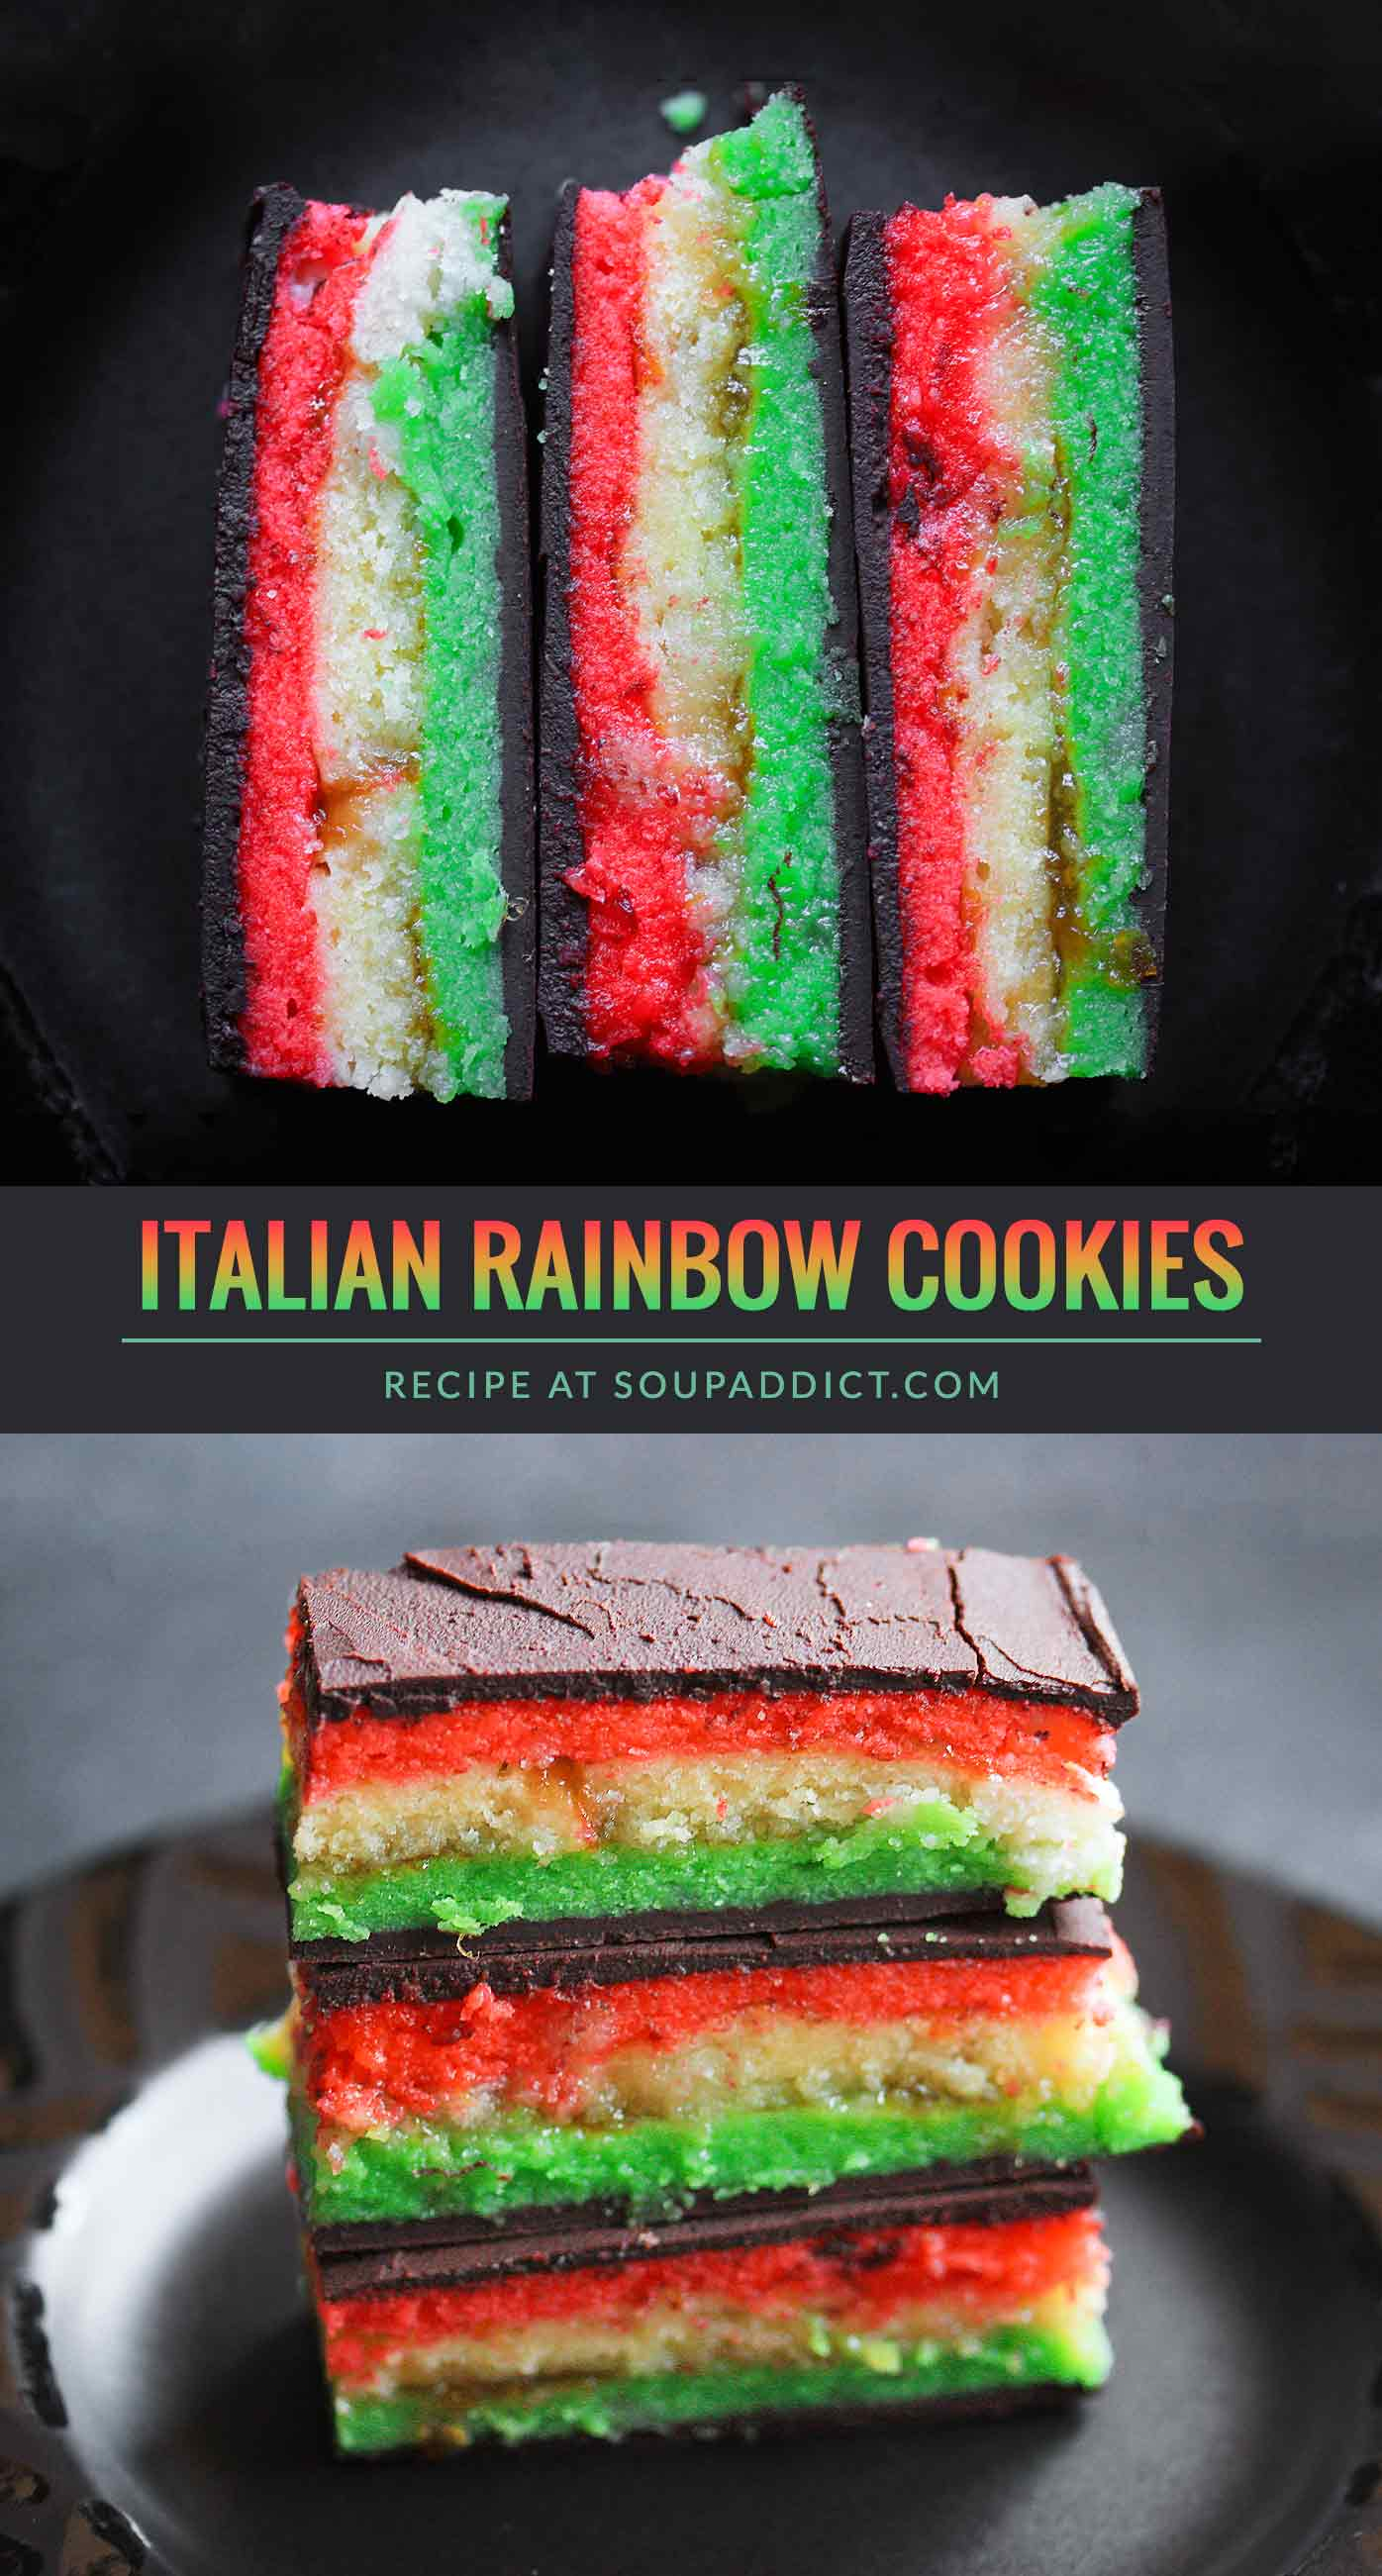 Italian Rainbow Cookies - Recipe at SoupAddict.com